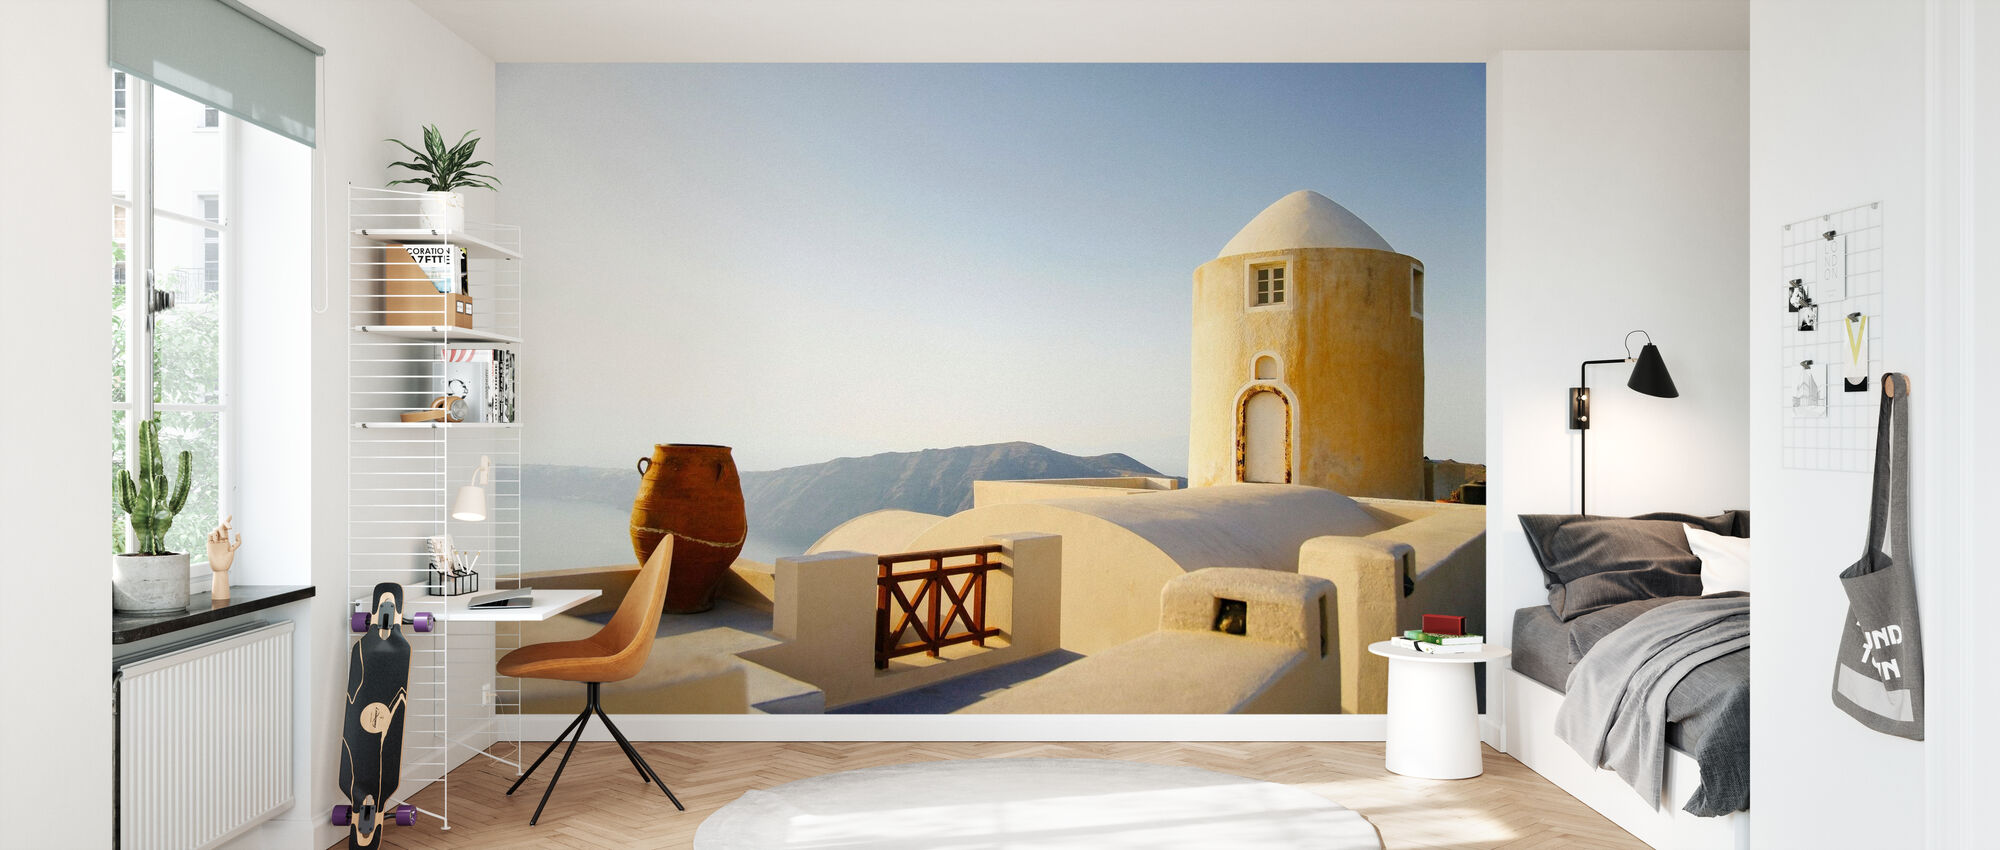 Santorini Building - Wallpaper - Kids Room